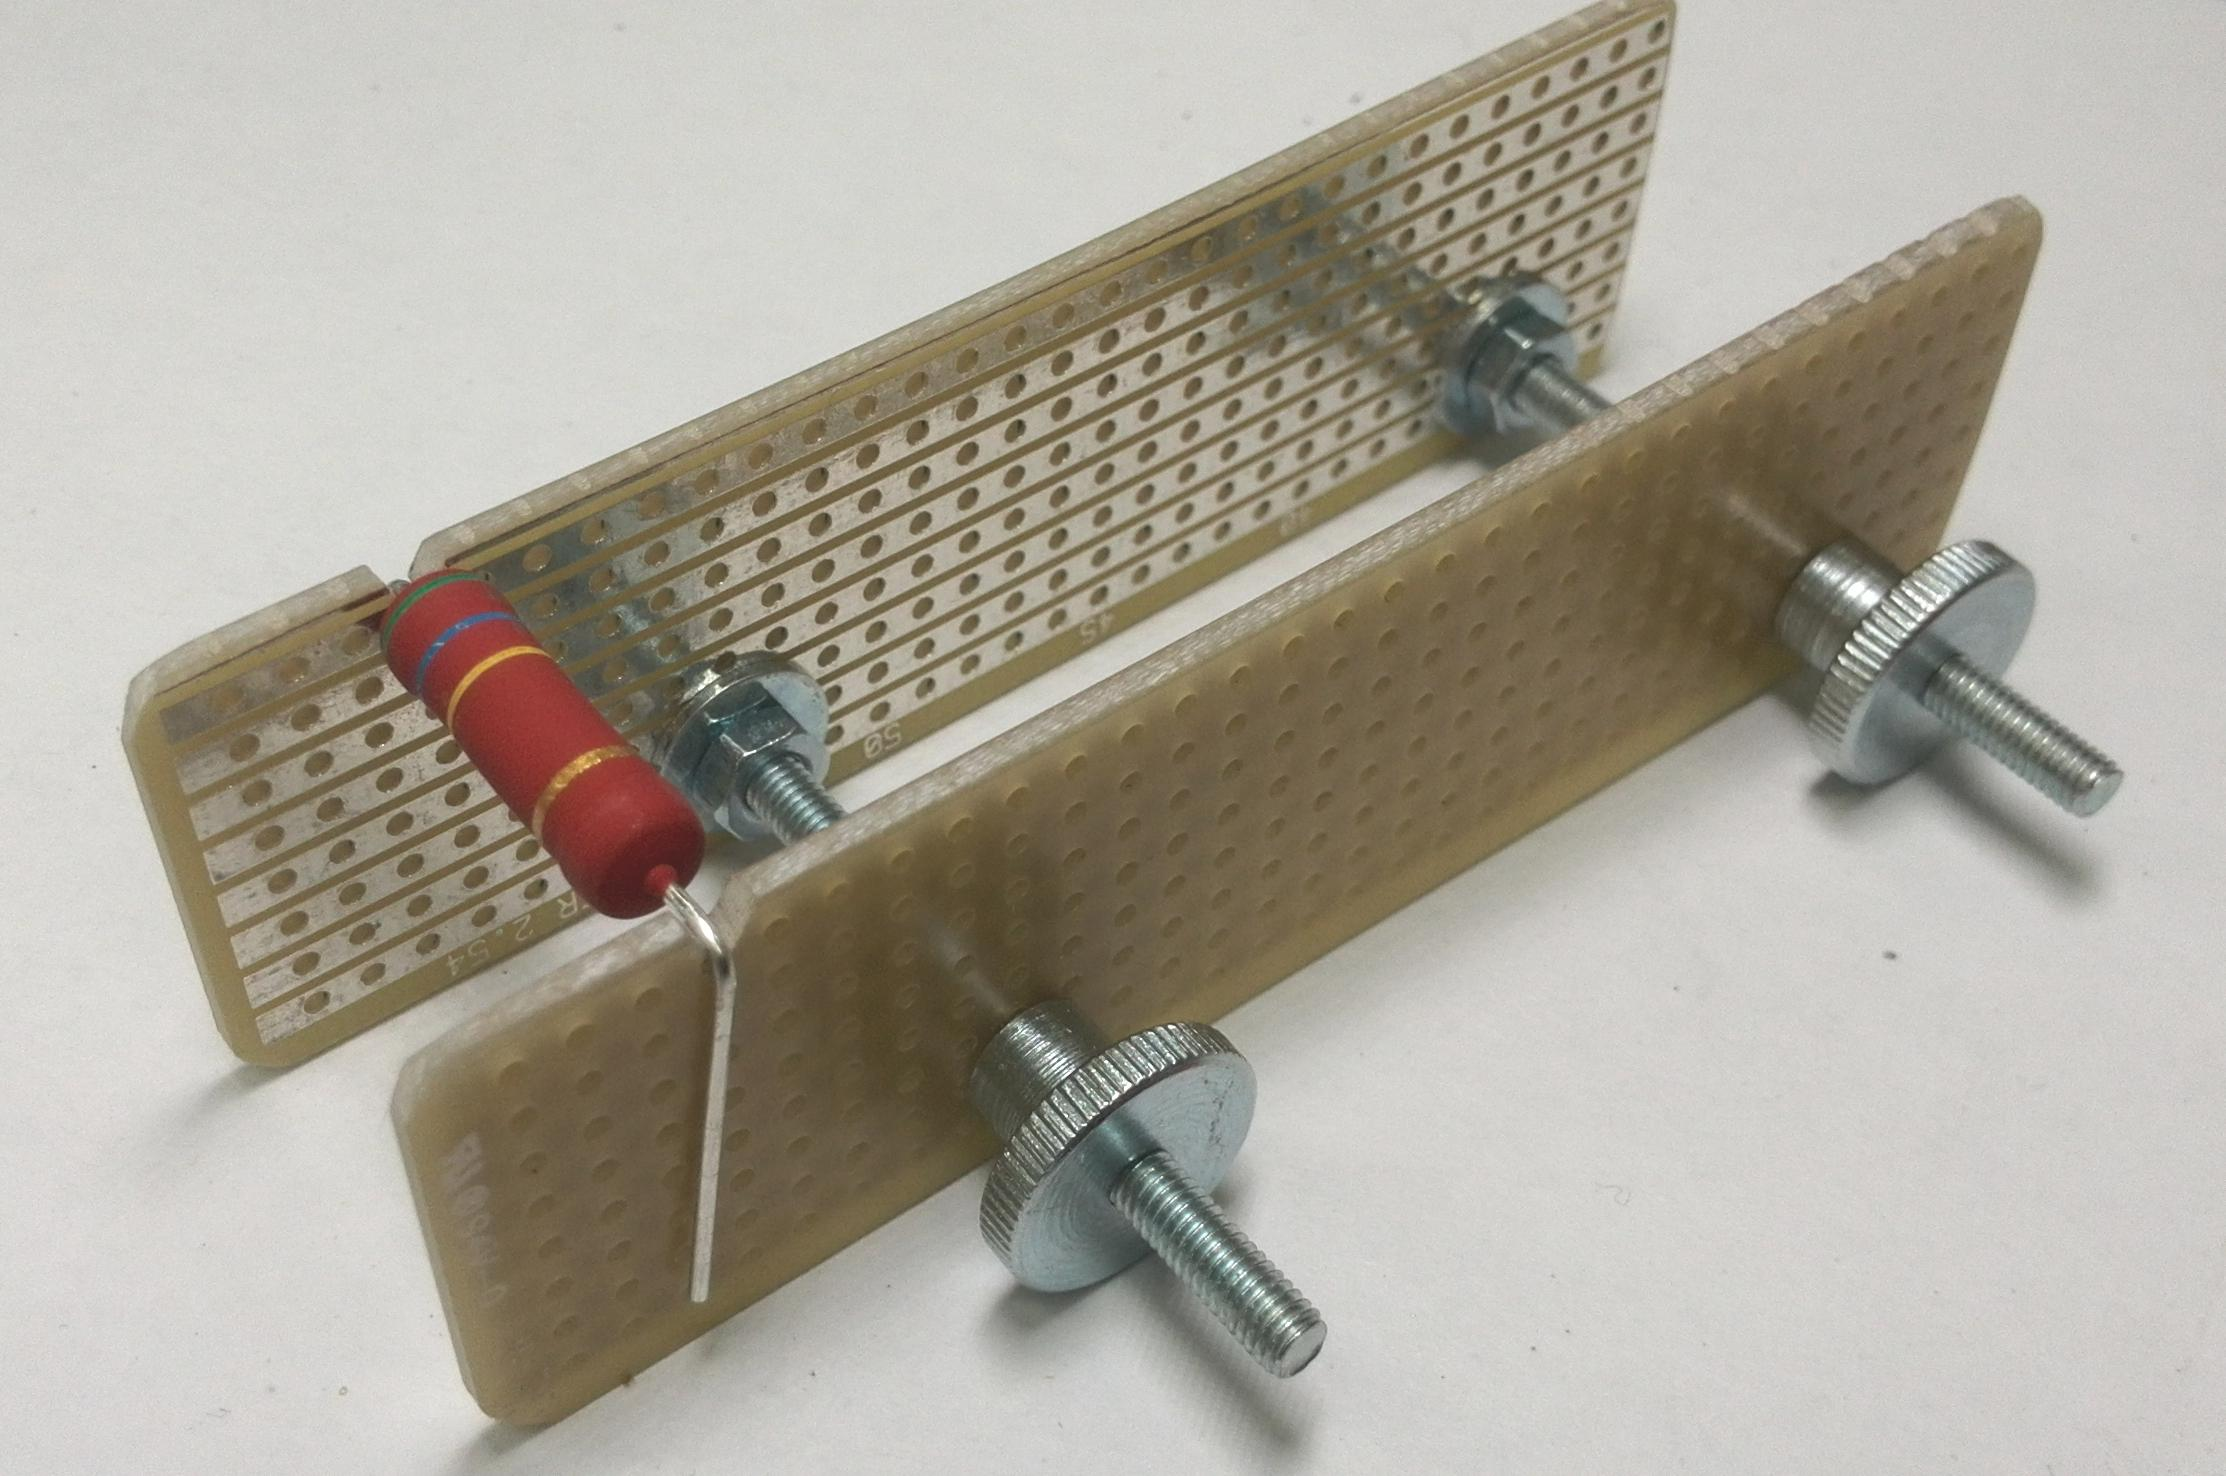 Bauteilbiegeleiste selbst gebaut Mikrocontroller